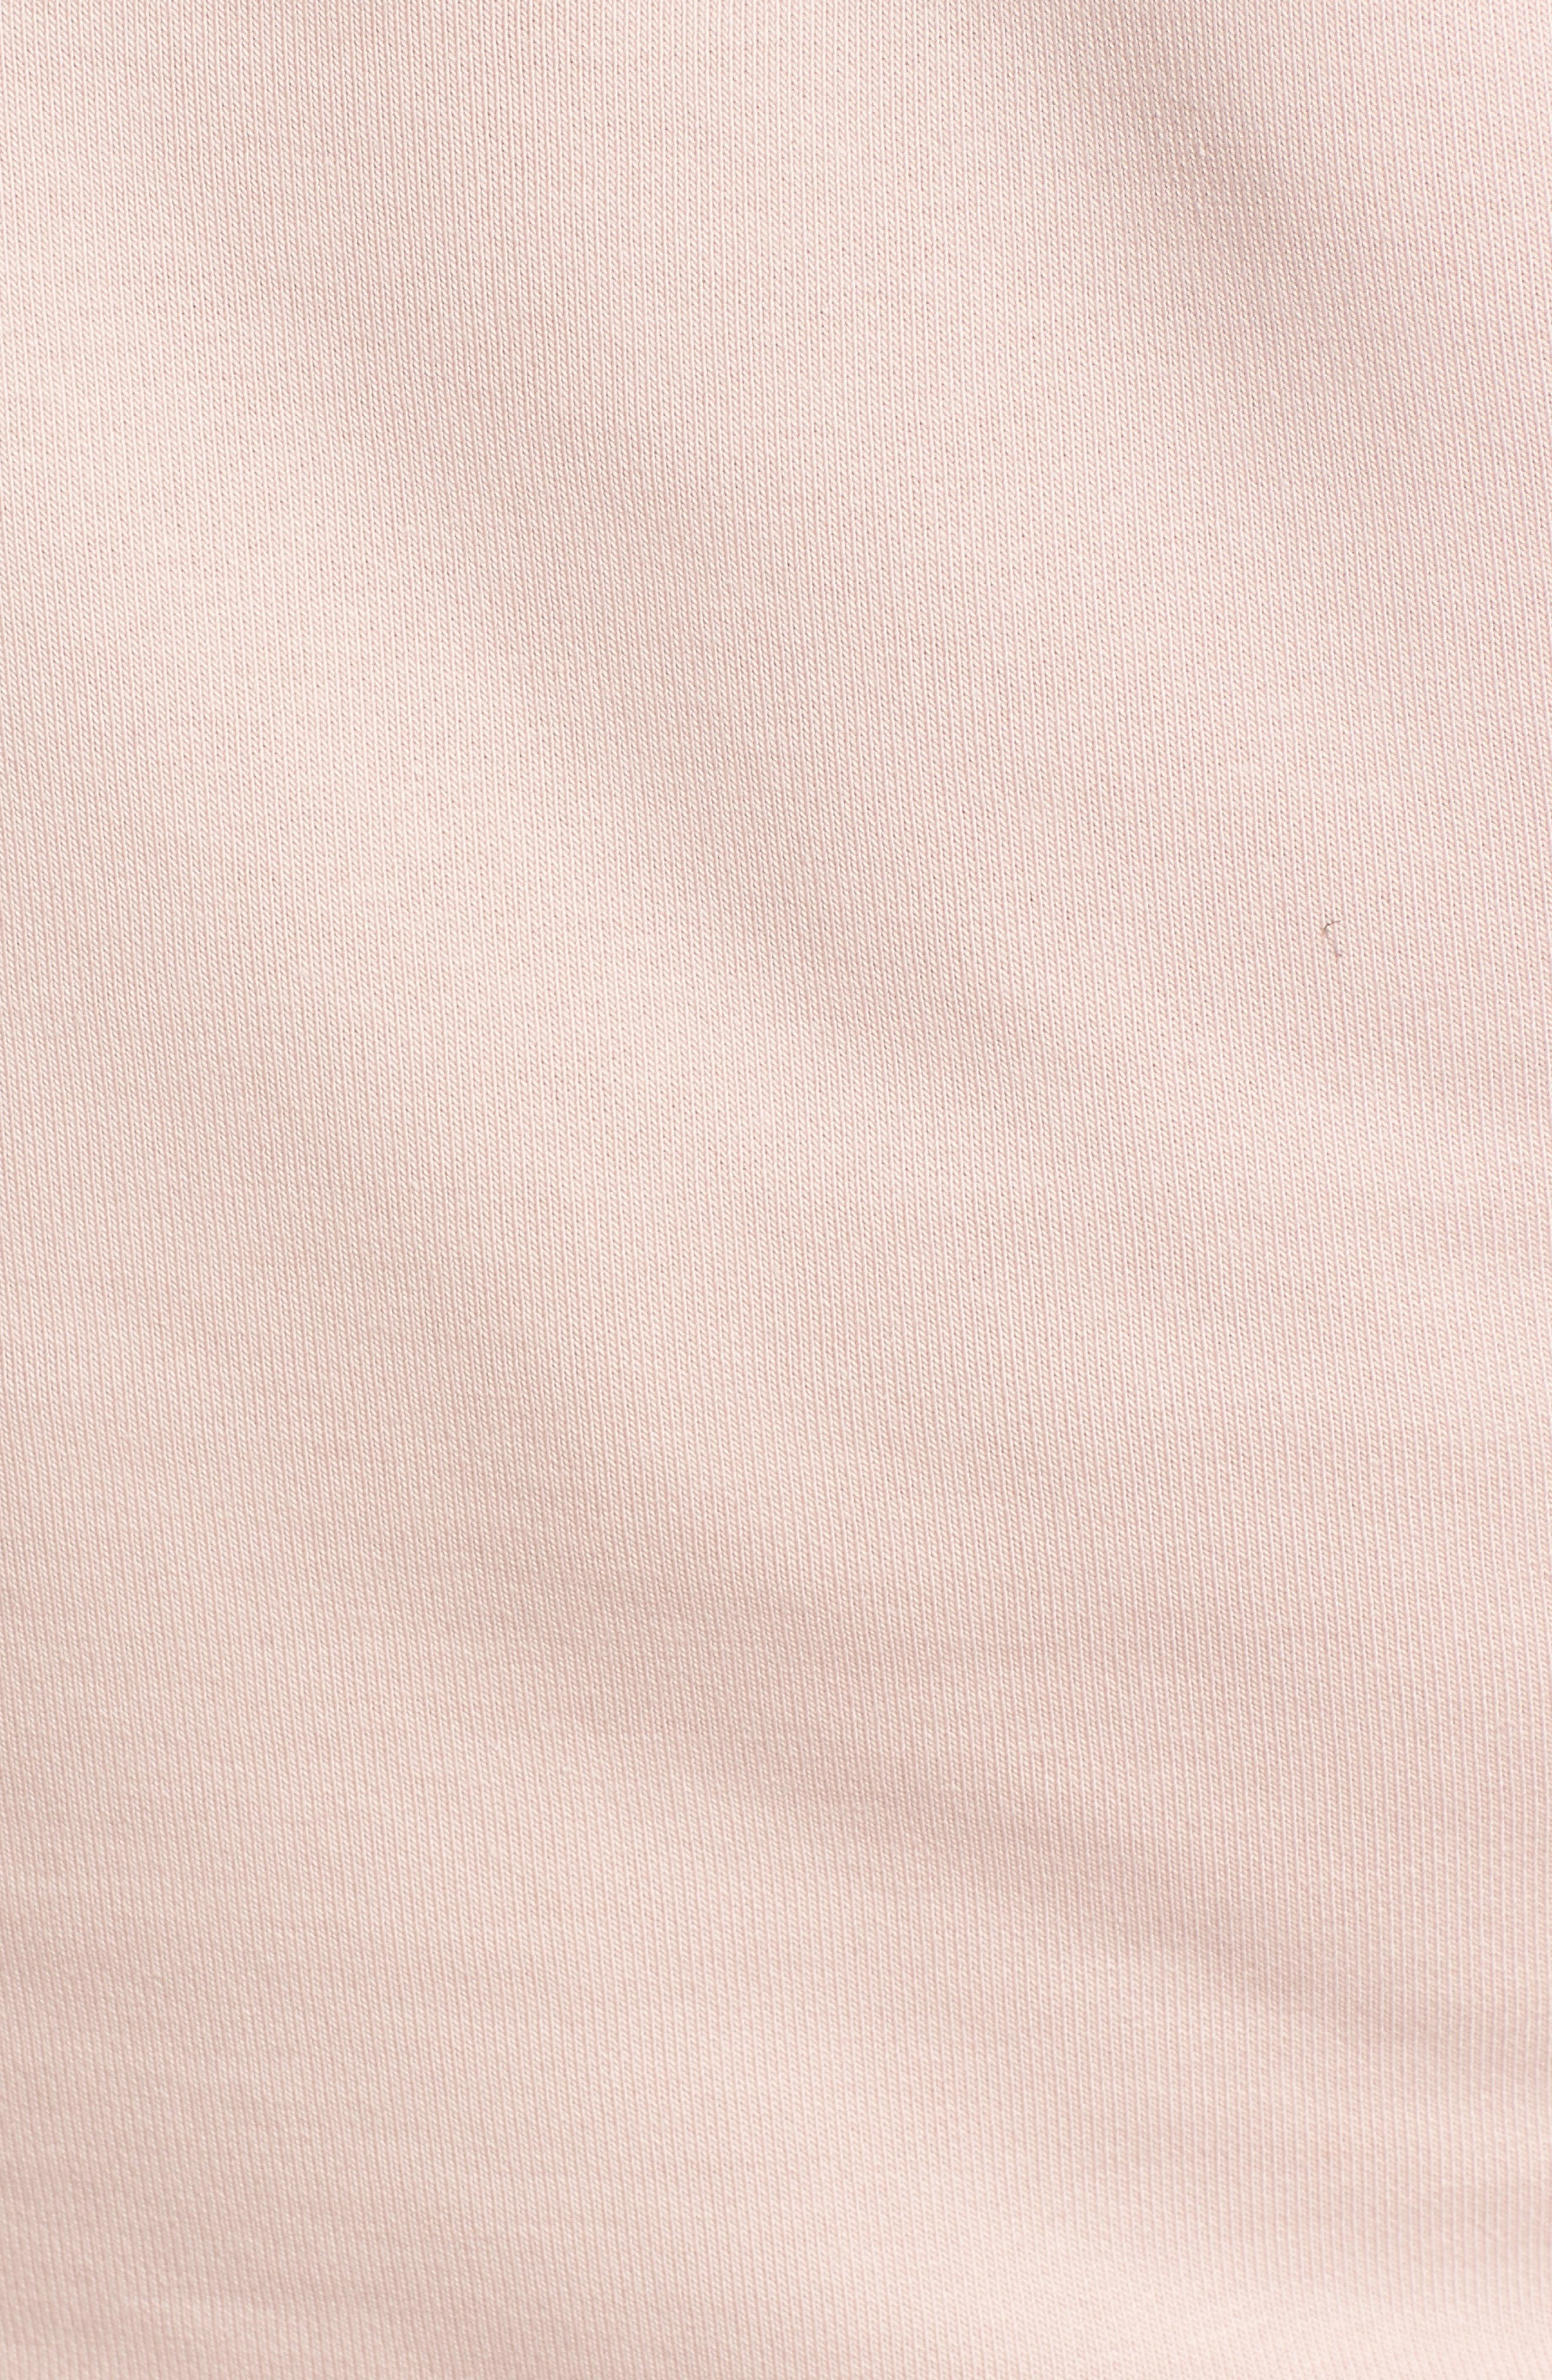 Football Lace-Up Sweatshirt,                             Alternate thumbnail 6, color,                             020